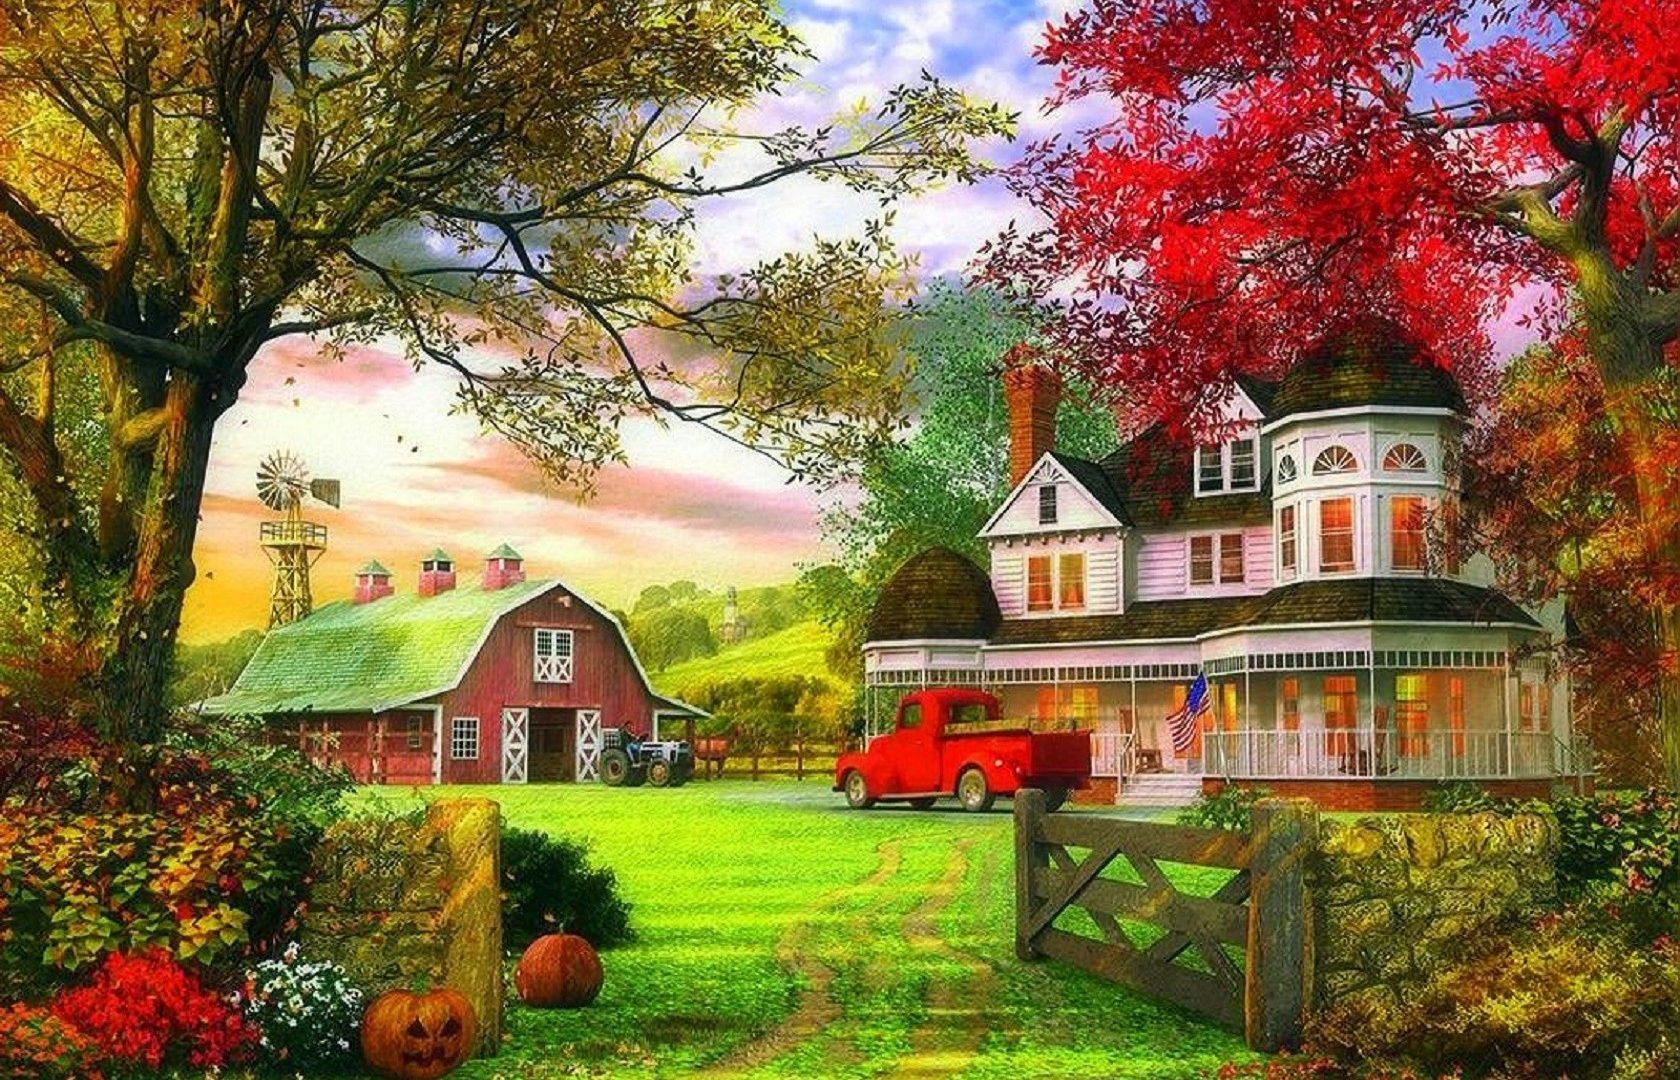 Farms Pumkin Farms Autumn Attractions Dreams Paintings 1680x1080